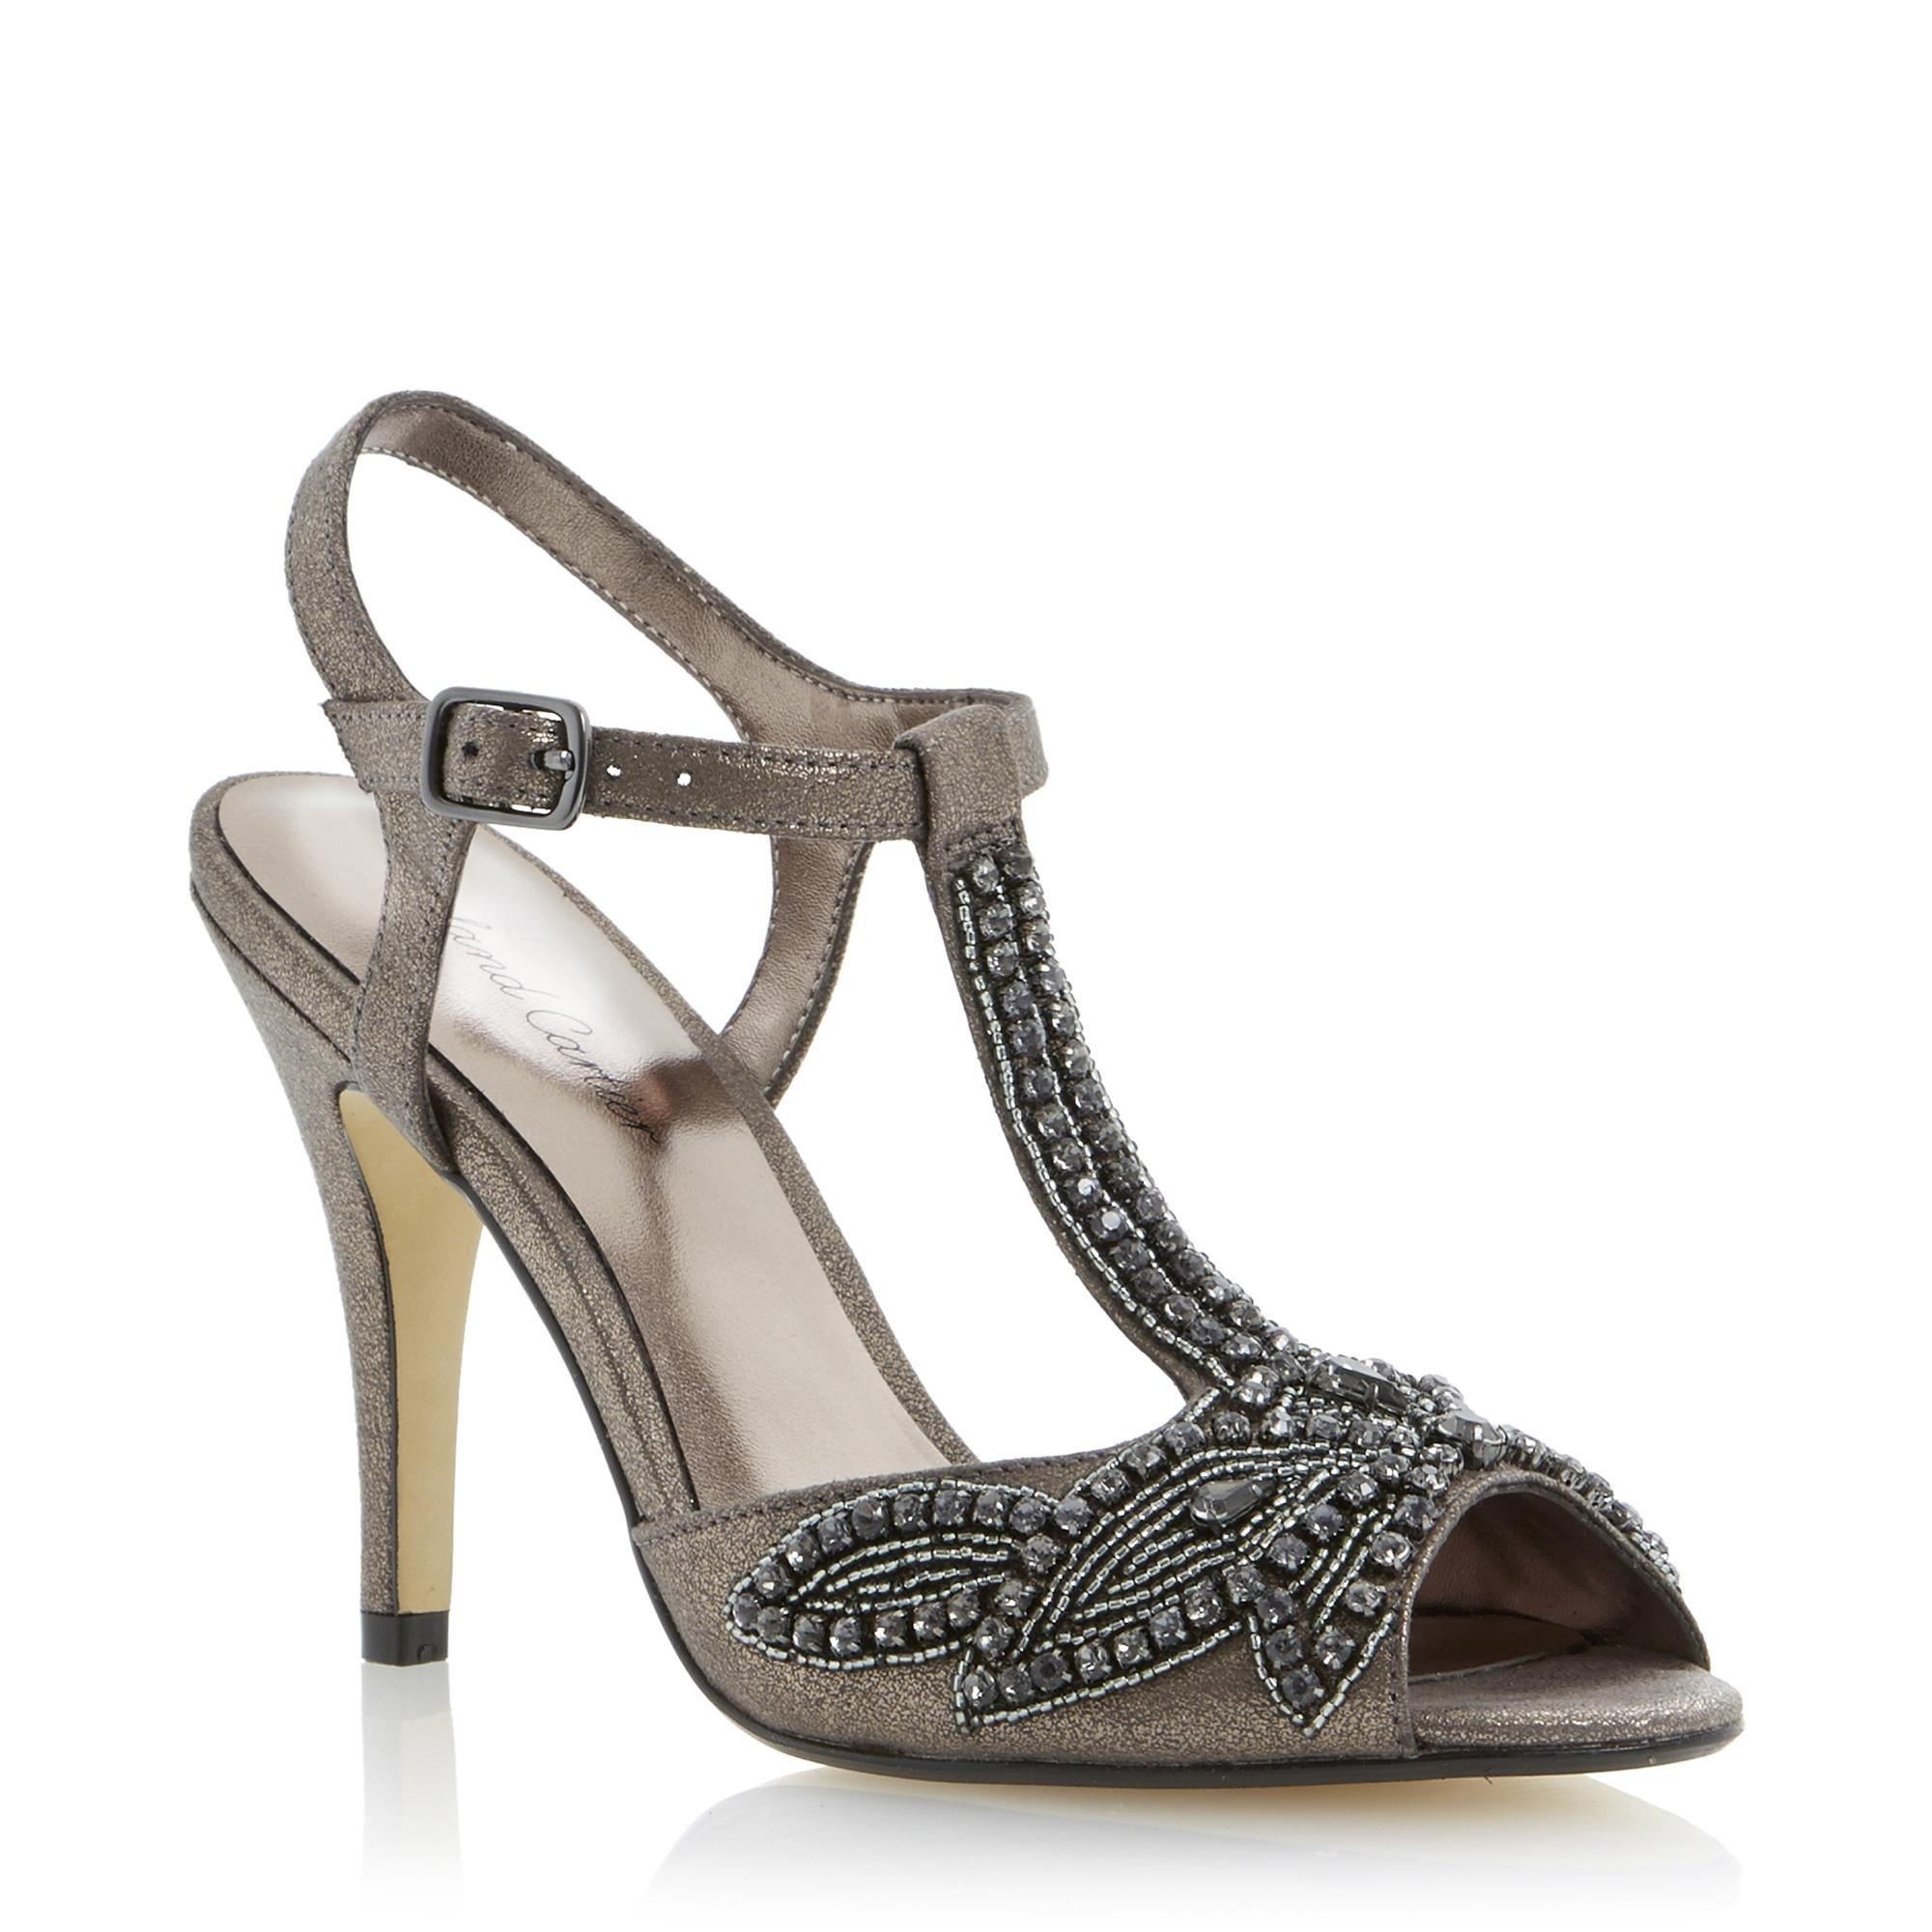 d6a3bd188c Roland Cartier Ladies HARKLE - Bead Embellished Peep Toe Sandal - pewter |  Dune Shoes Online